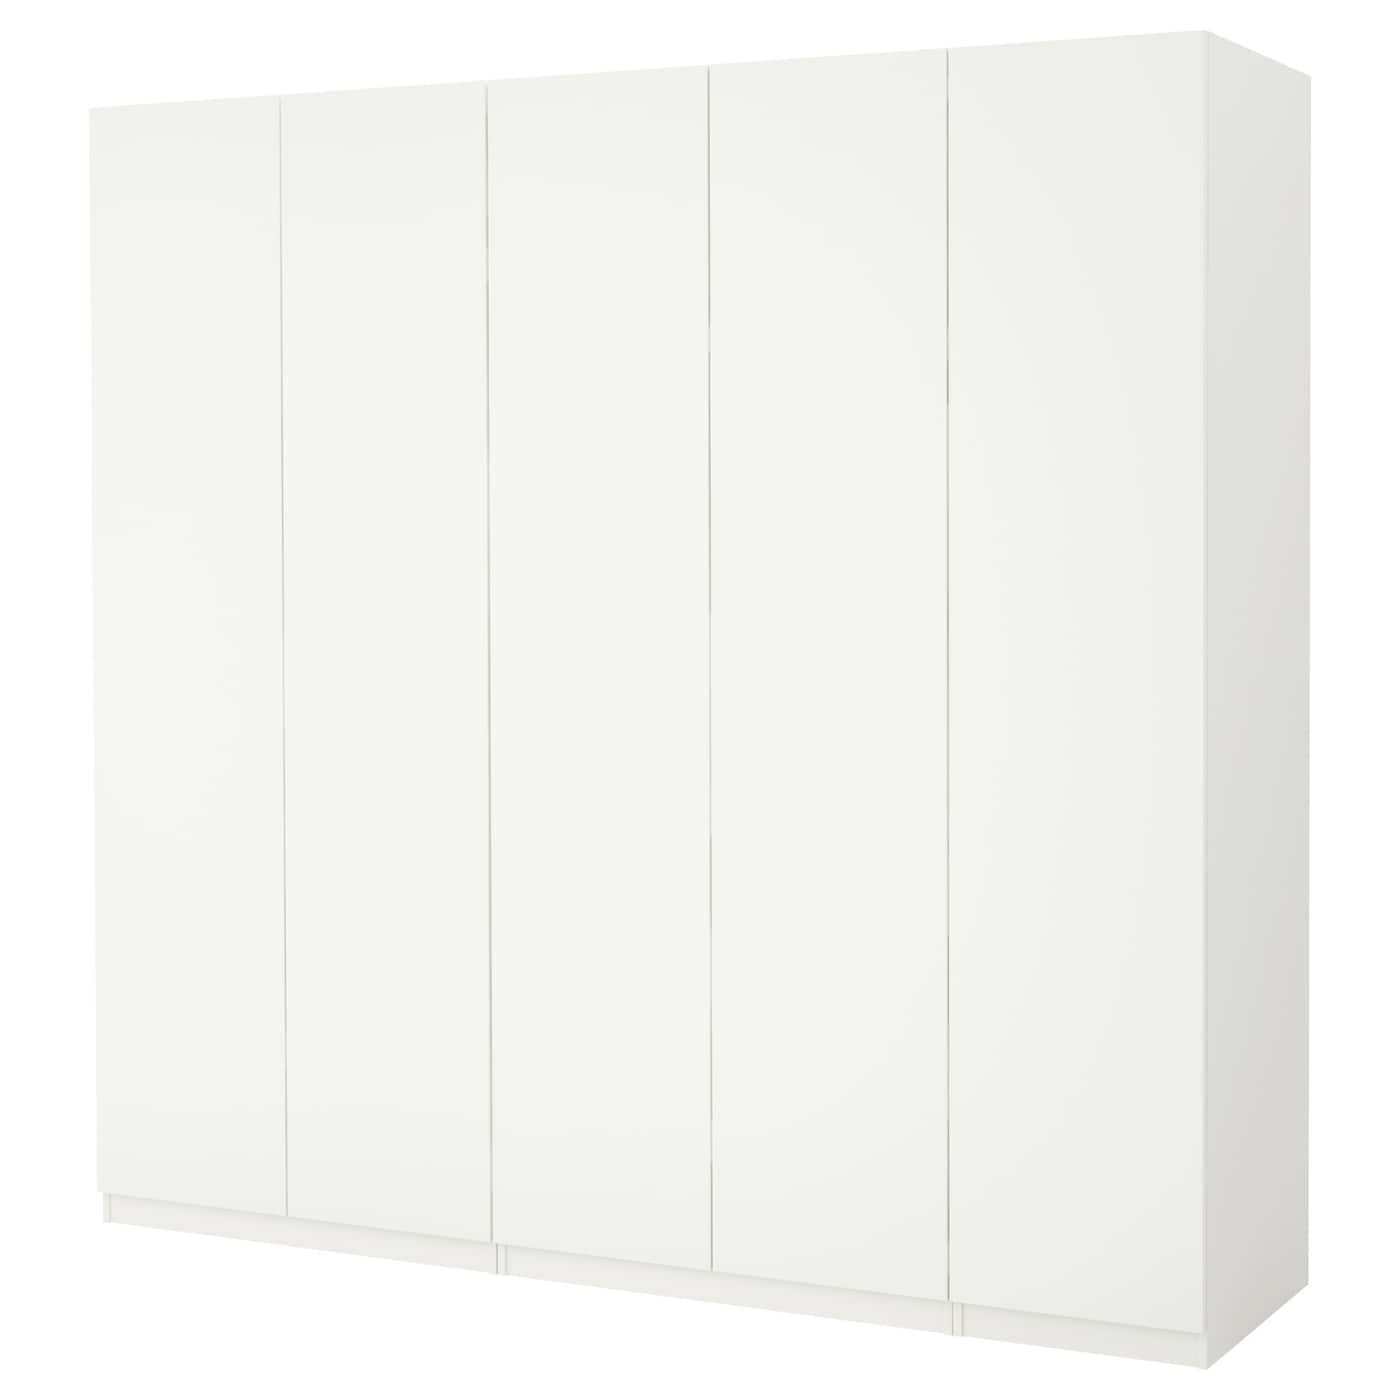 Pax armoire penderie blanc ballstad blanc 250x60x236 cm ikea for Armoire peu profonde